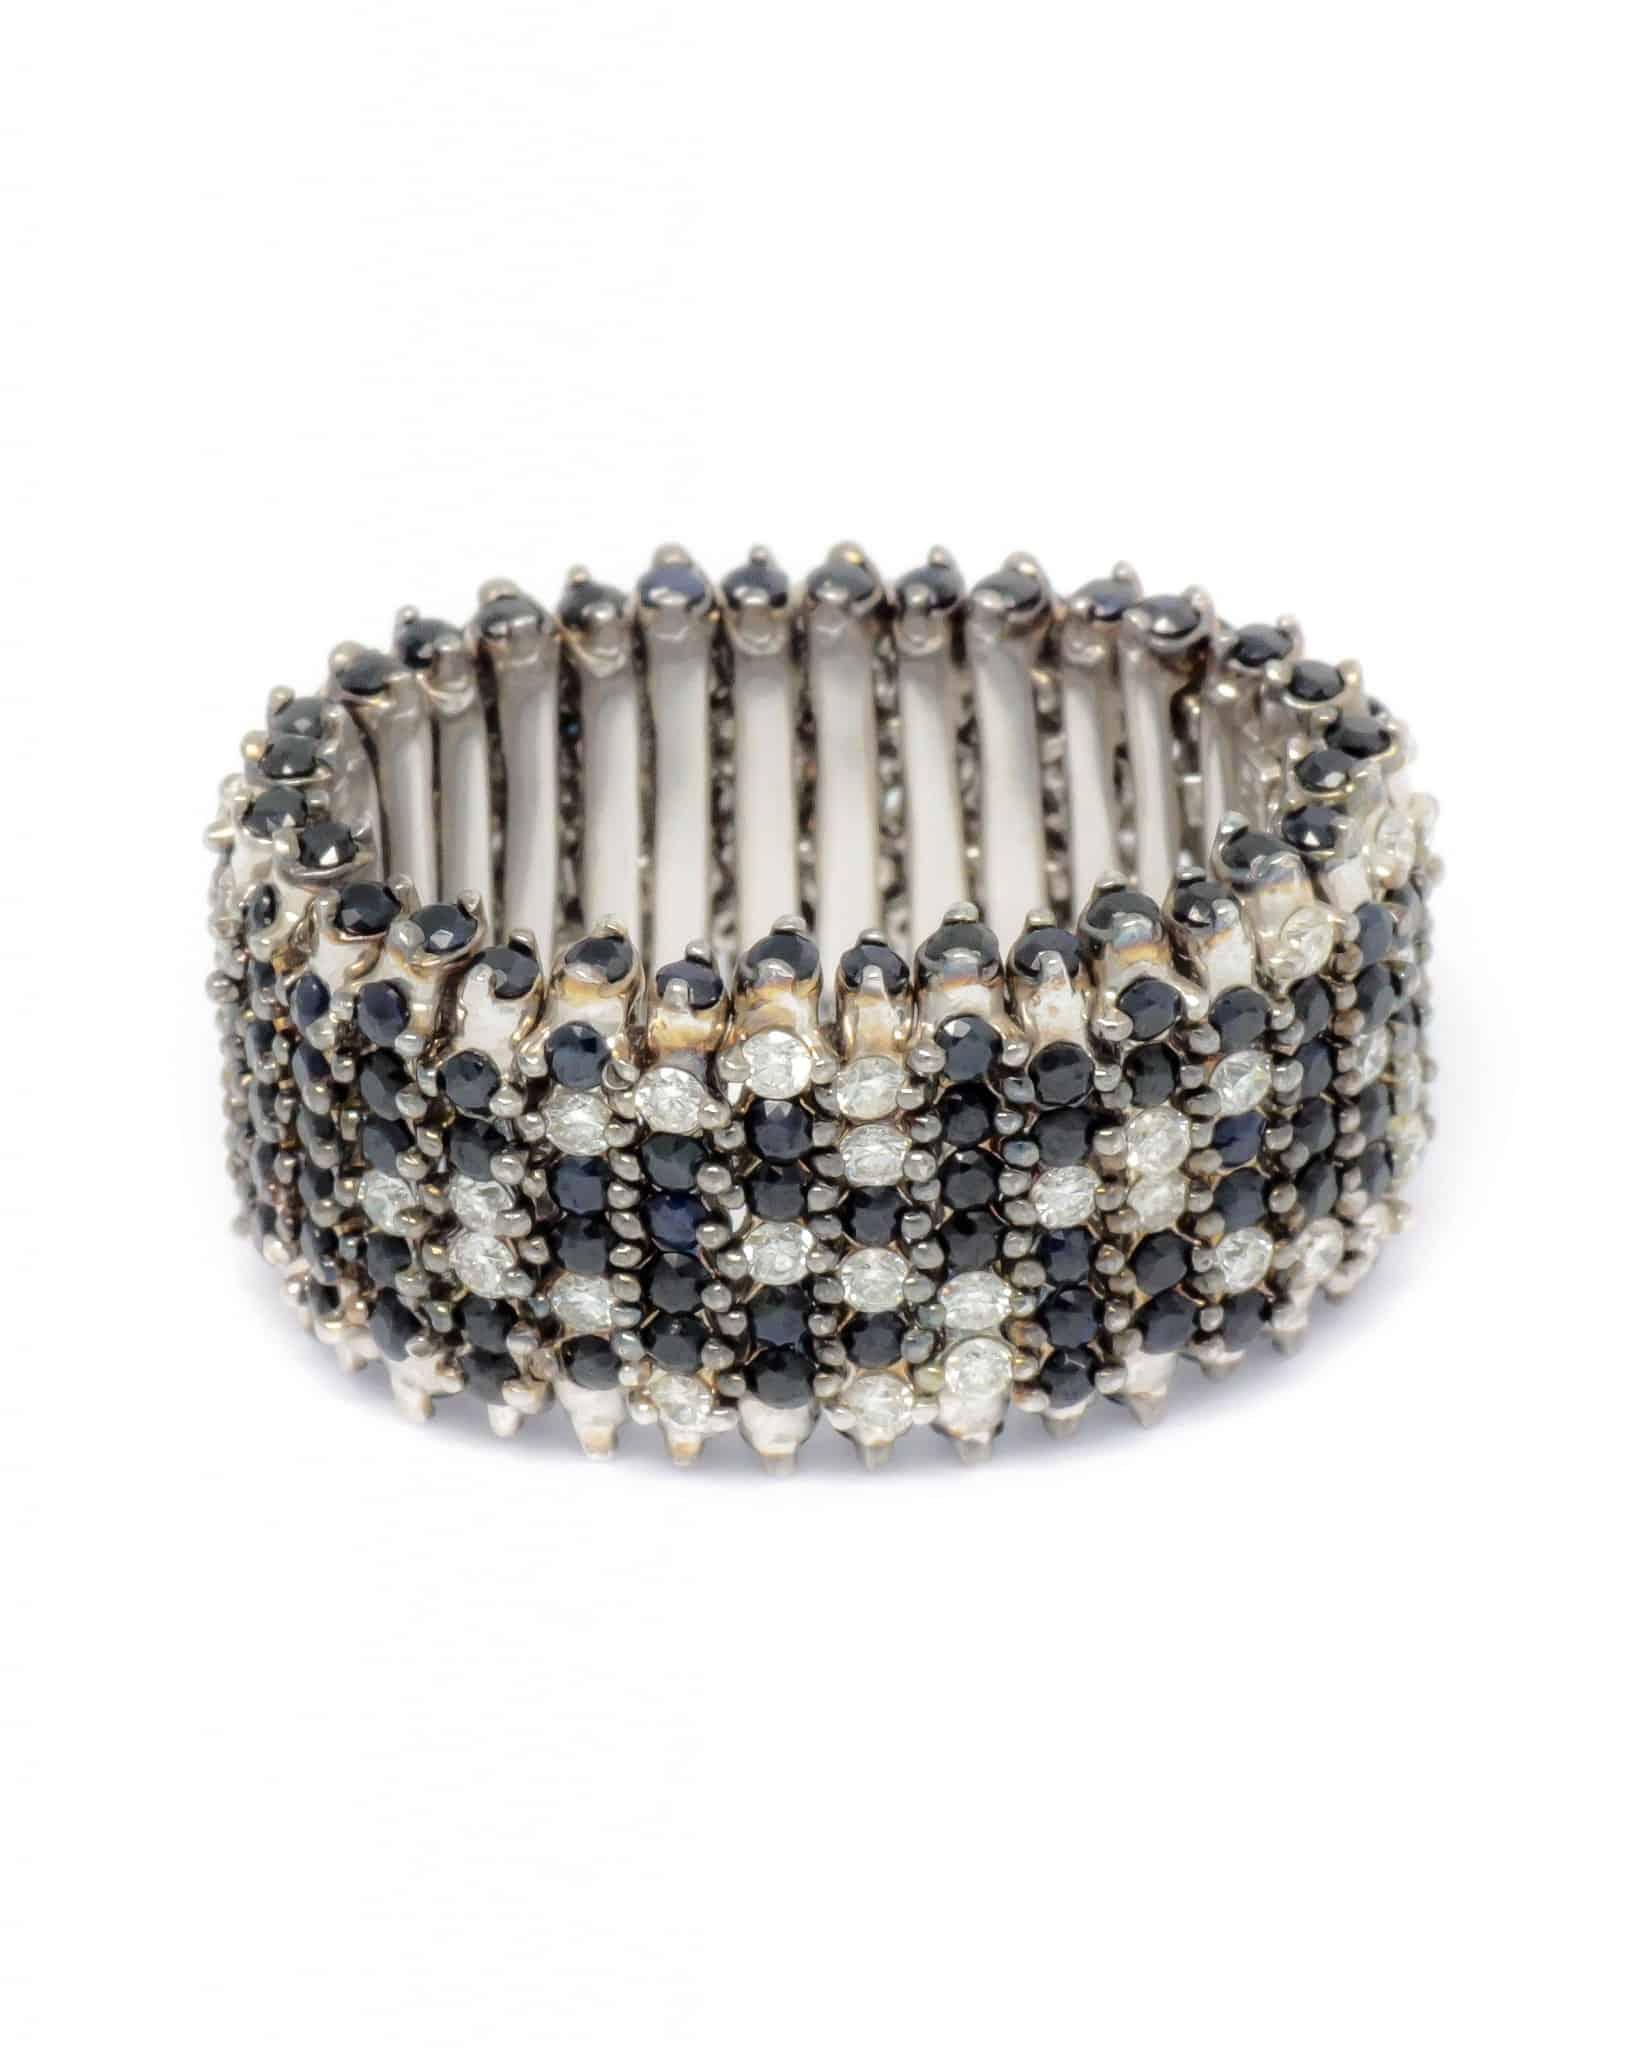 ROBERTO COIN 18K White Gold Diamonds & Blk Sapphire Ring sz 7.25 273417AWLRBD